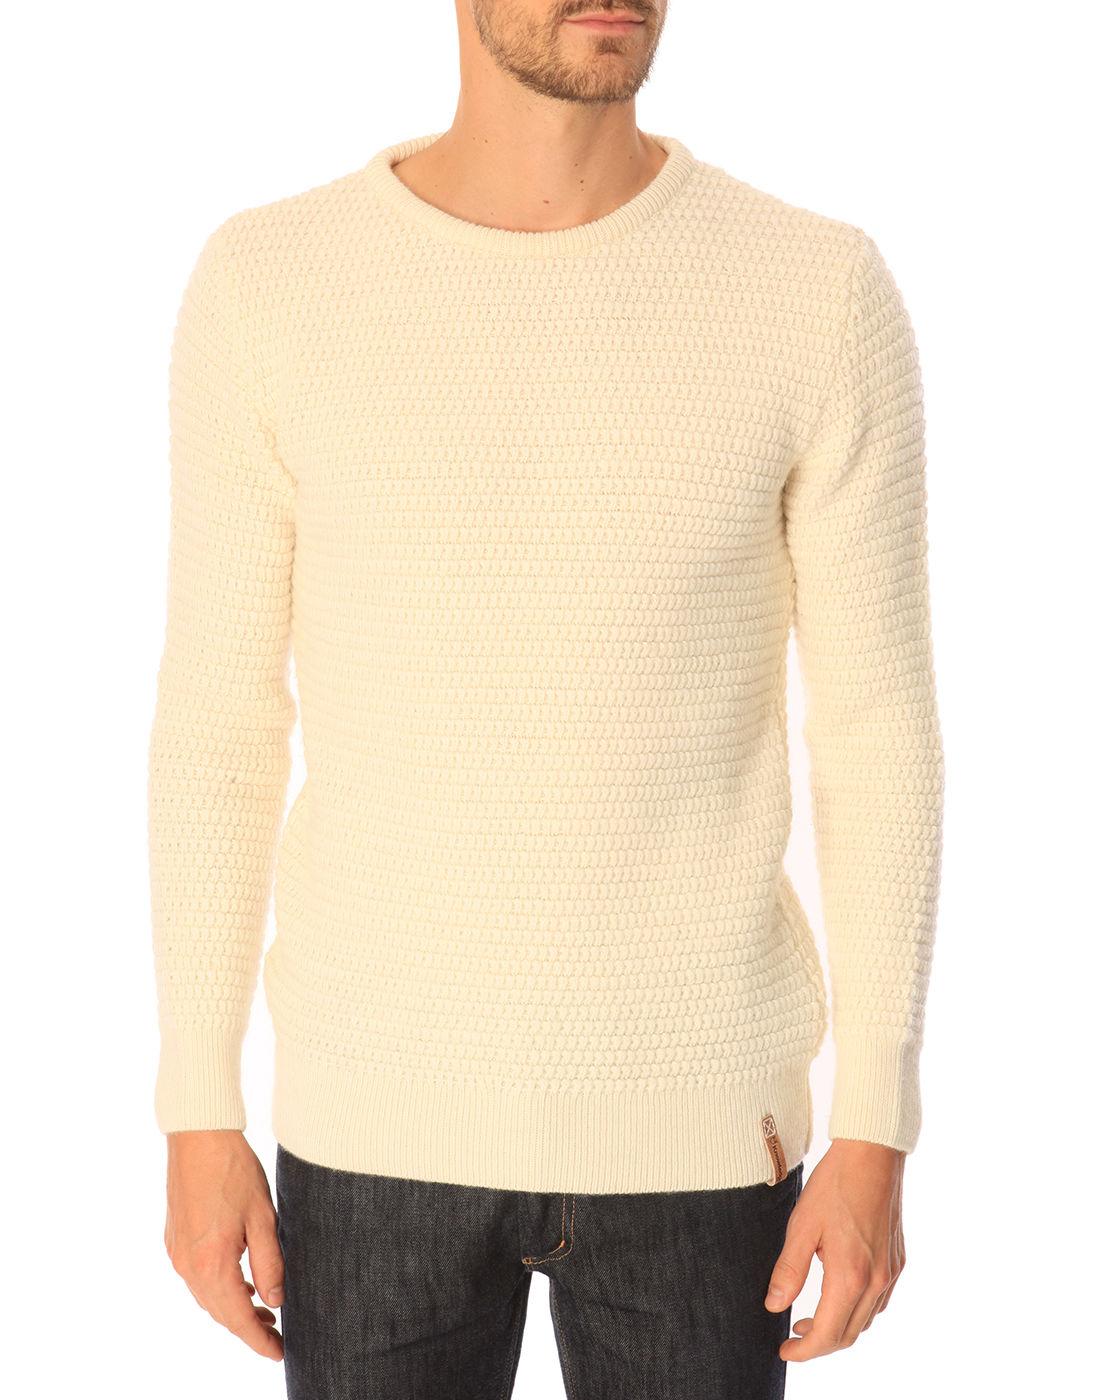 knowledge cotton apparel fancy knit off white round neck. Black Bedroom Furniture Sets. Home Design Ideas